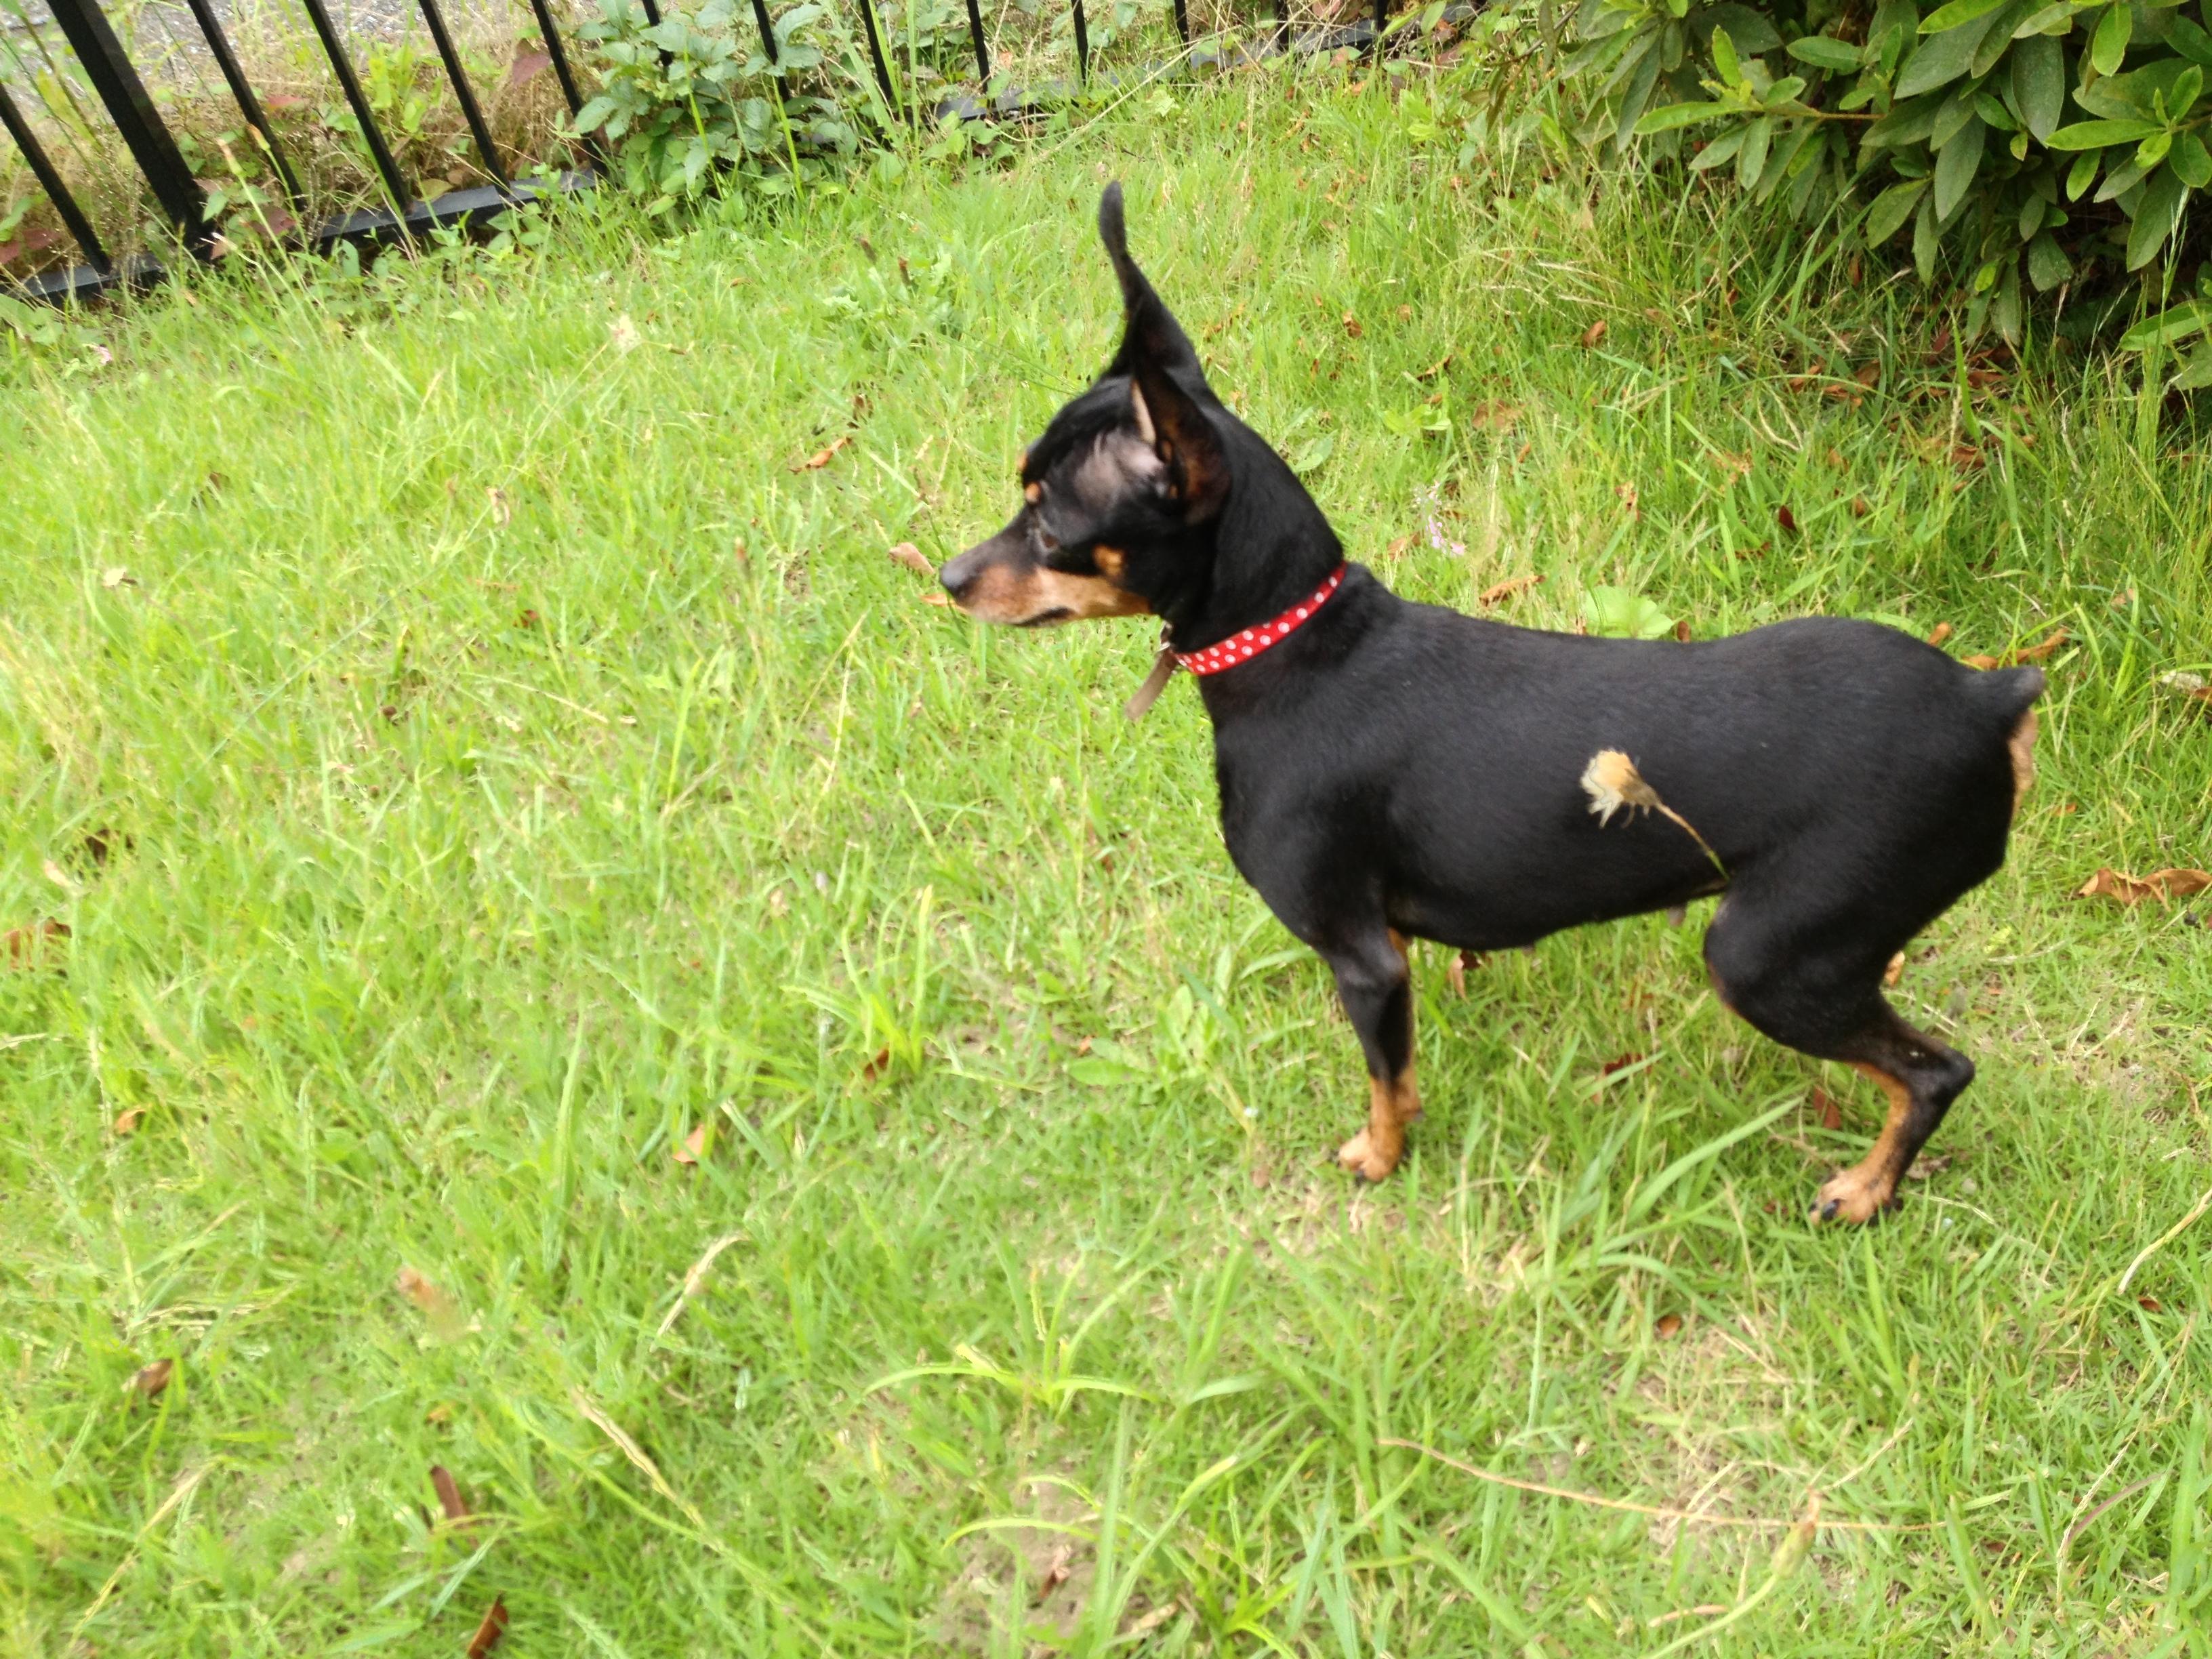 File:Female miniature pinscher breed of dog in grassy park in Yokohama,  Japan.jpg - Wikimedia Commons